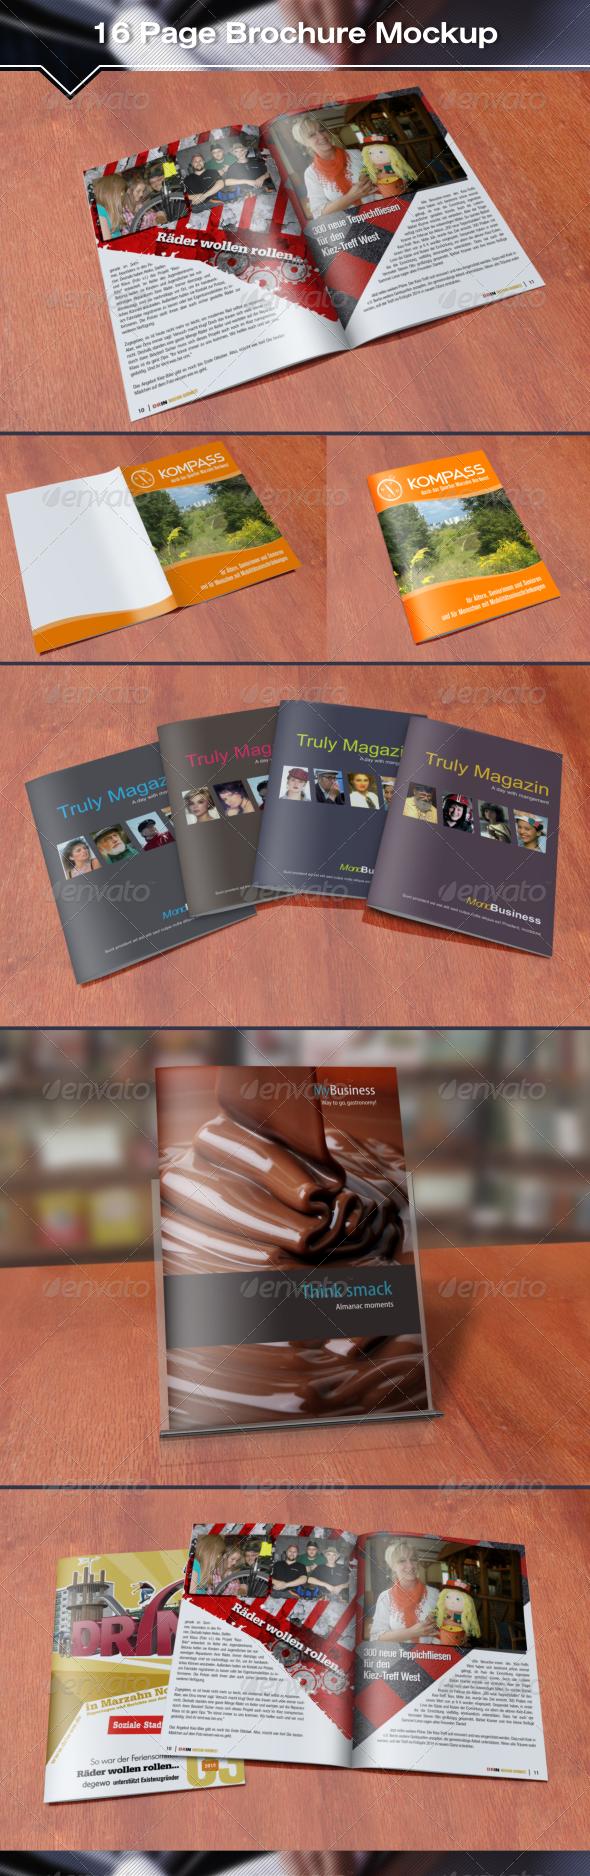 16 Page Brochure Mockup - Brochures Print